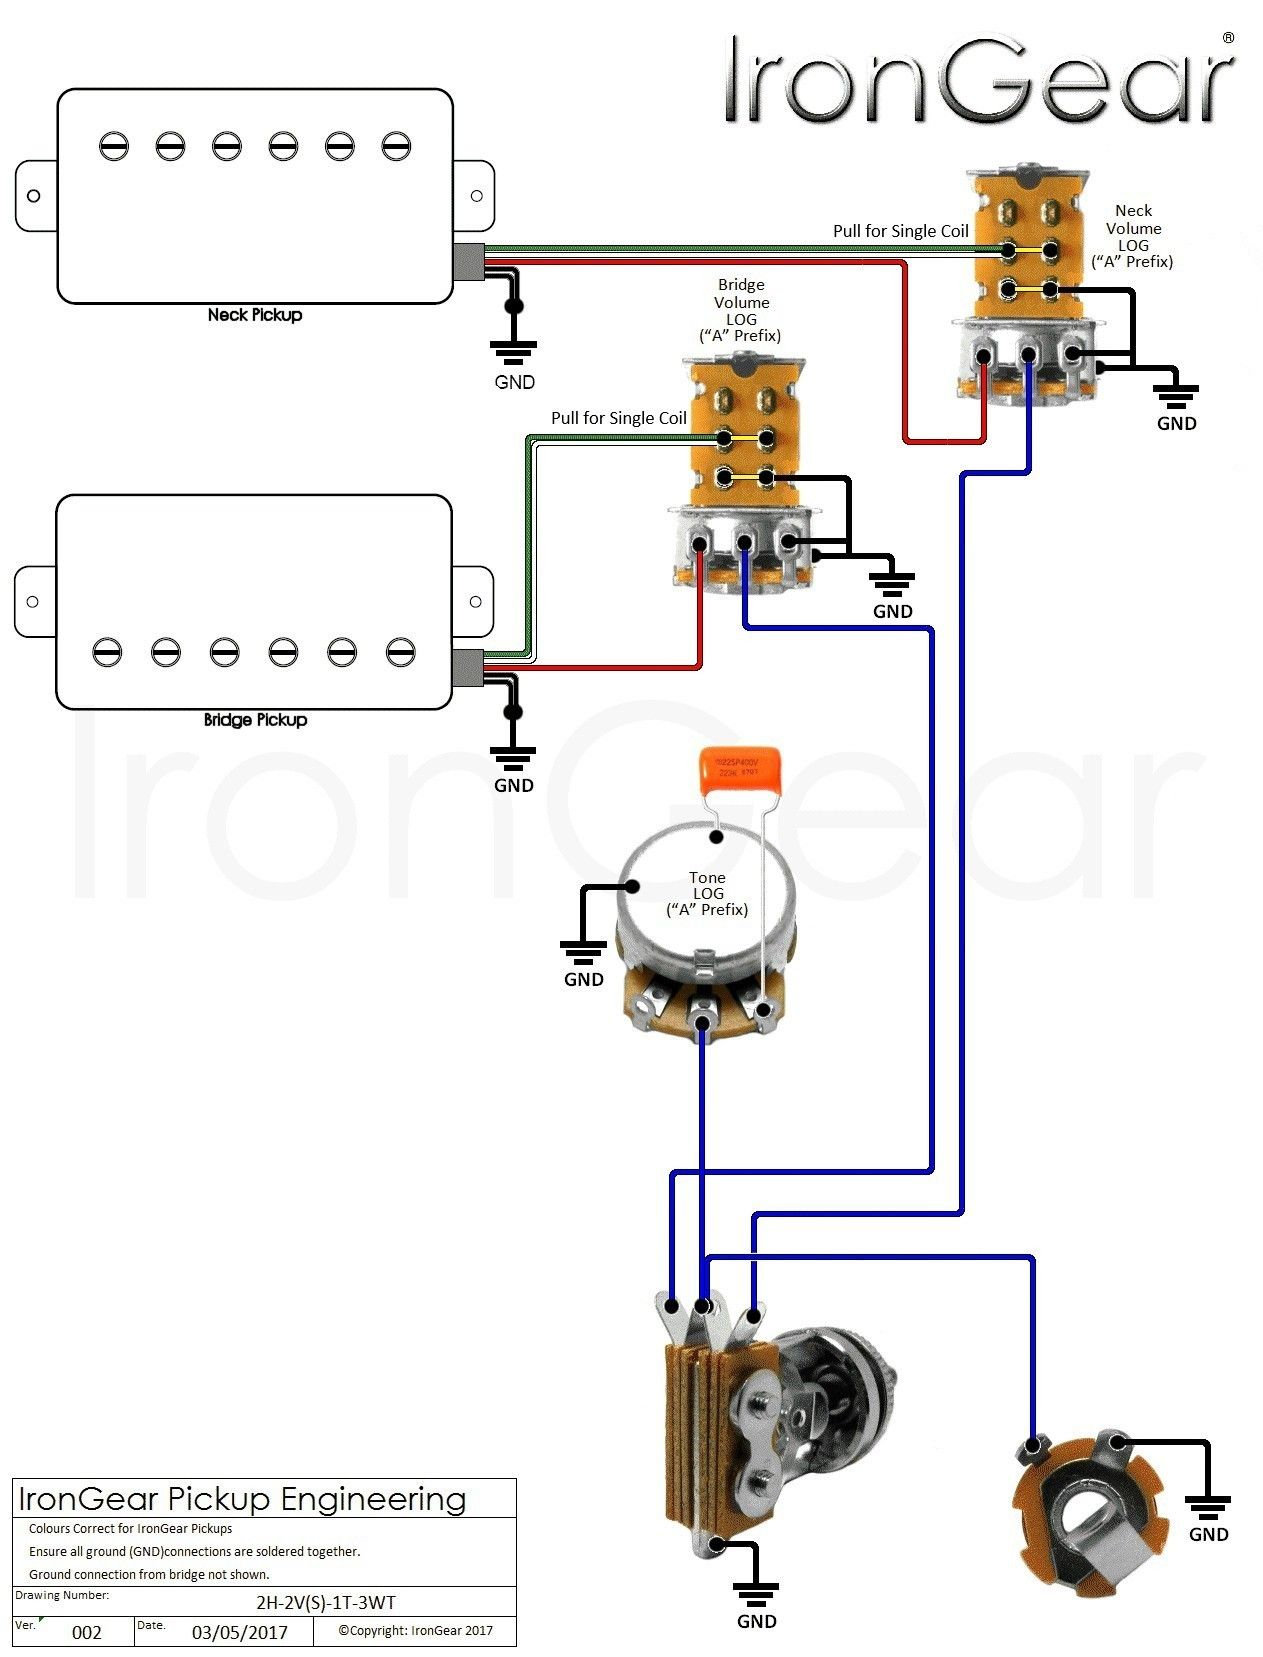 hight resolution of 2 humbucker 1 vo1 wiring diagrams top engine fuse diagram u2022 rh 2 humbucker 1 vo1 wiring diagrams